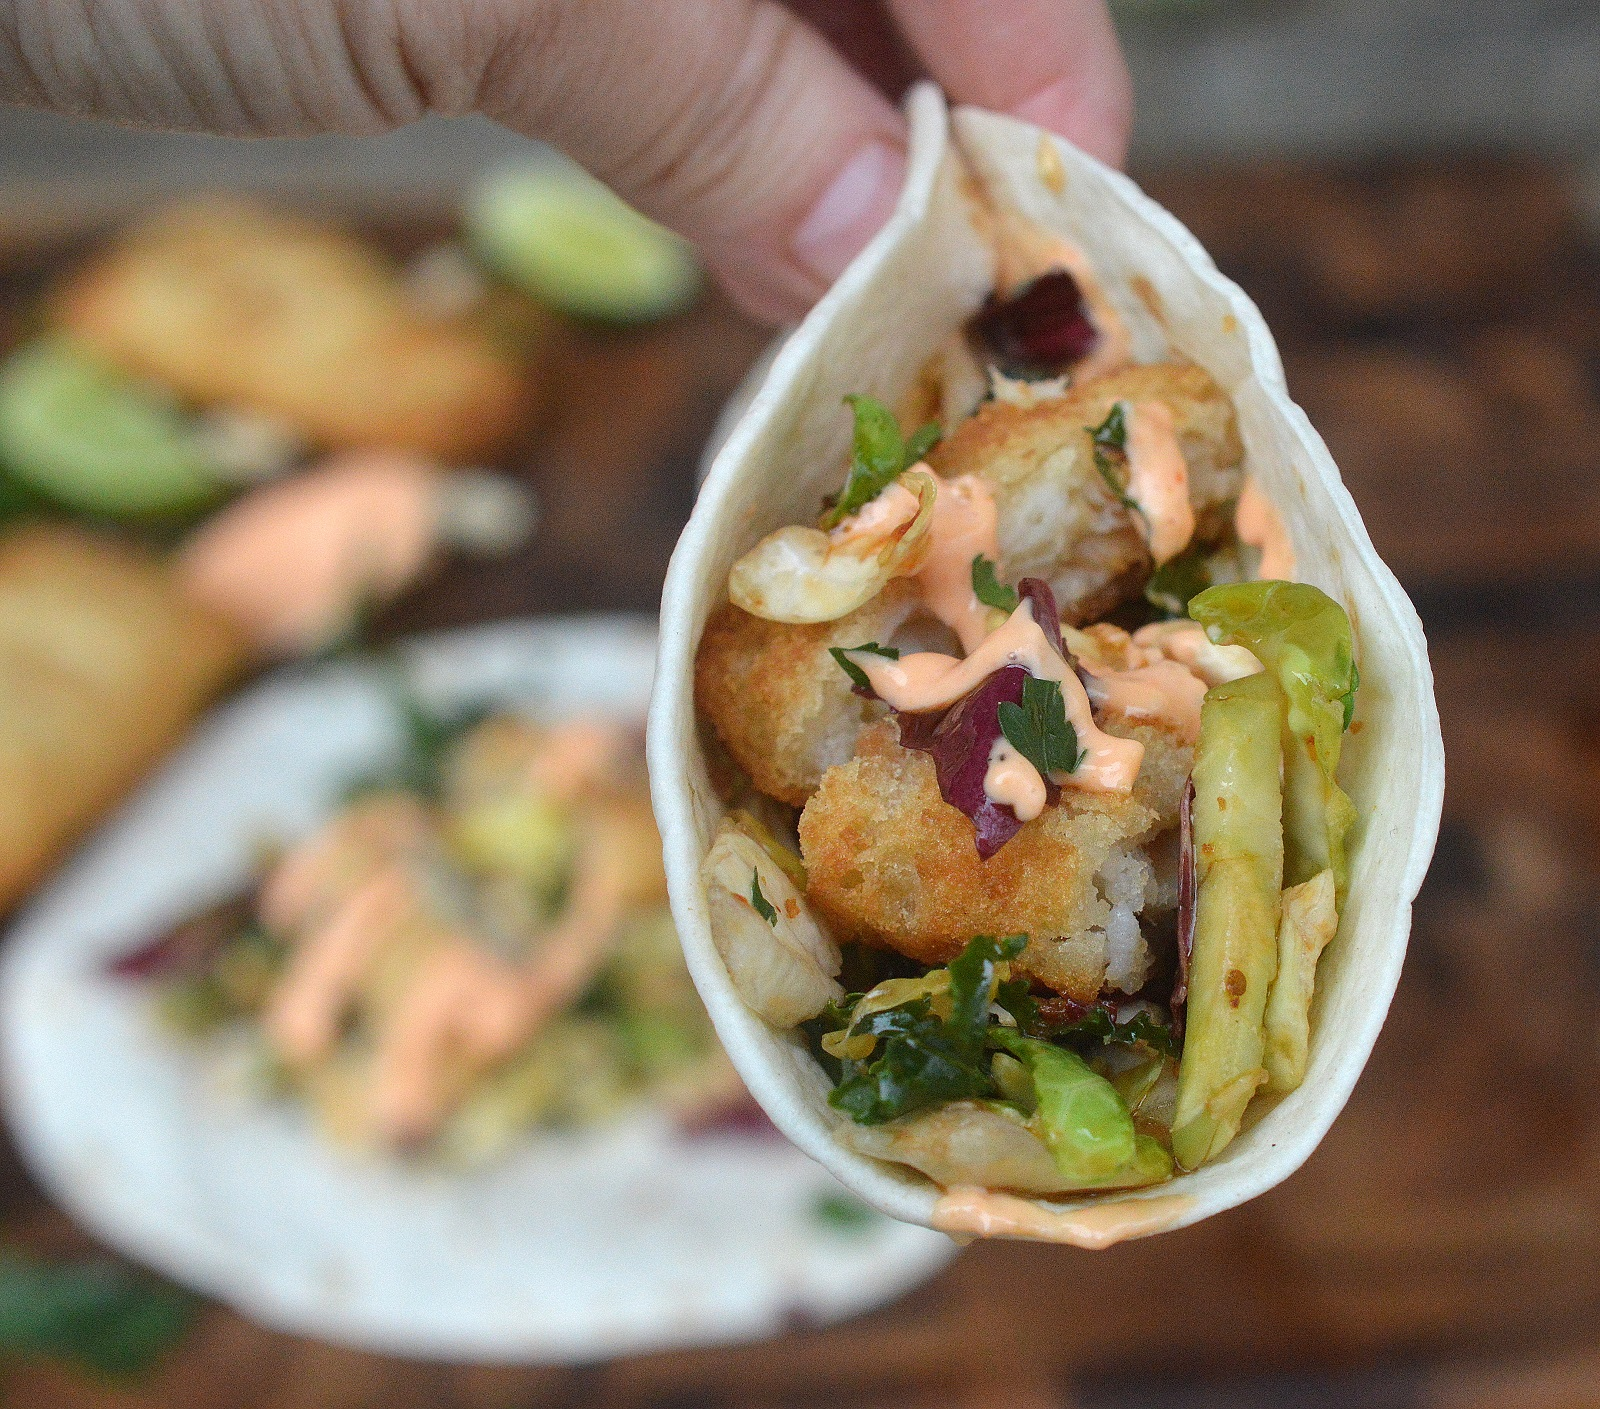 Crispy Fish Tacos with Asian Slaw and Sriracha Mayo